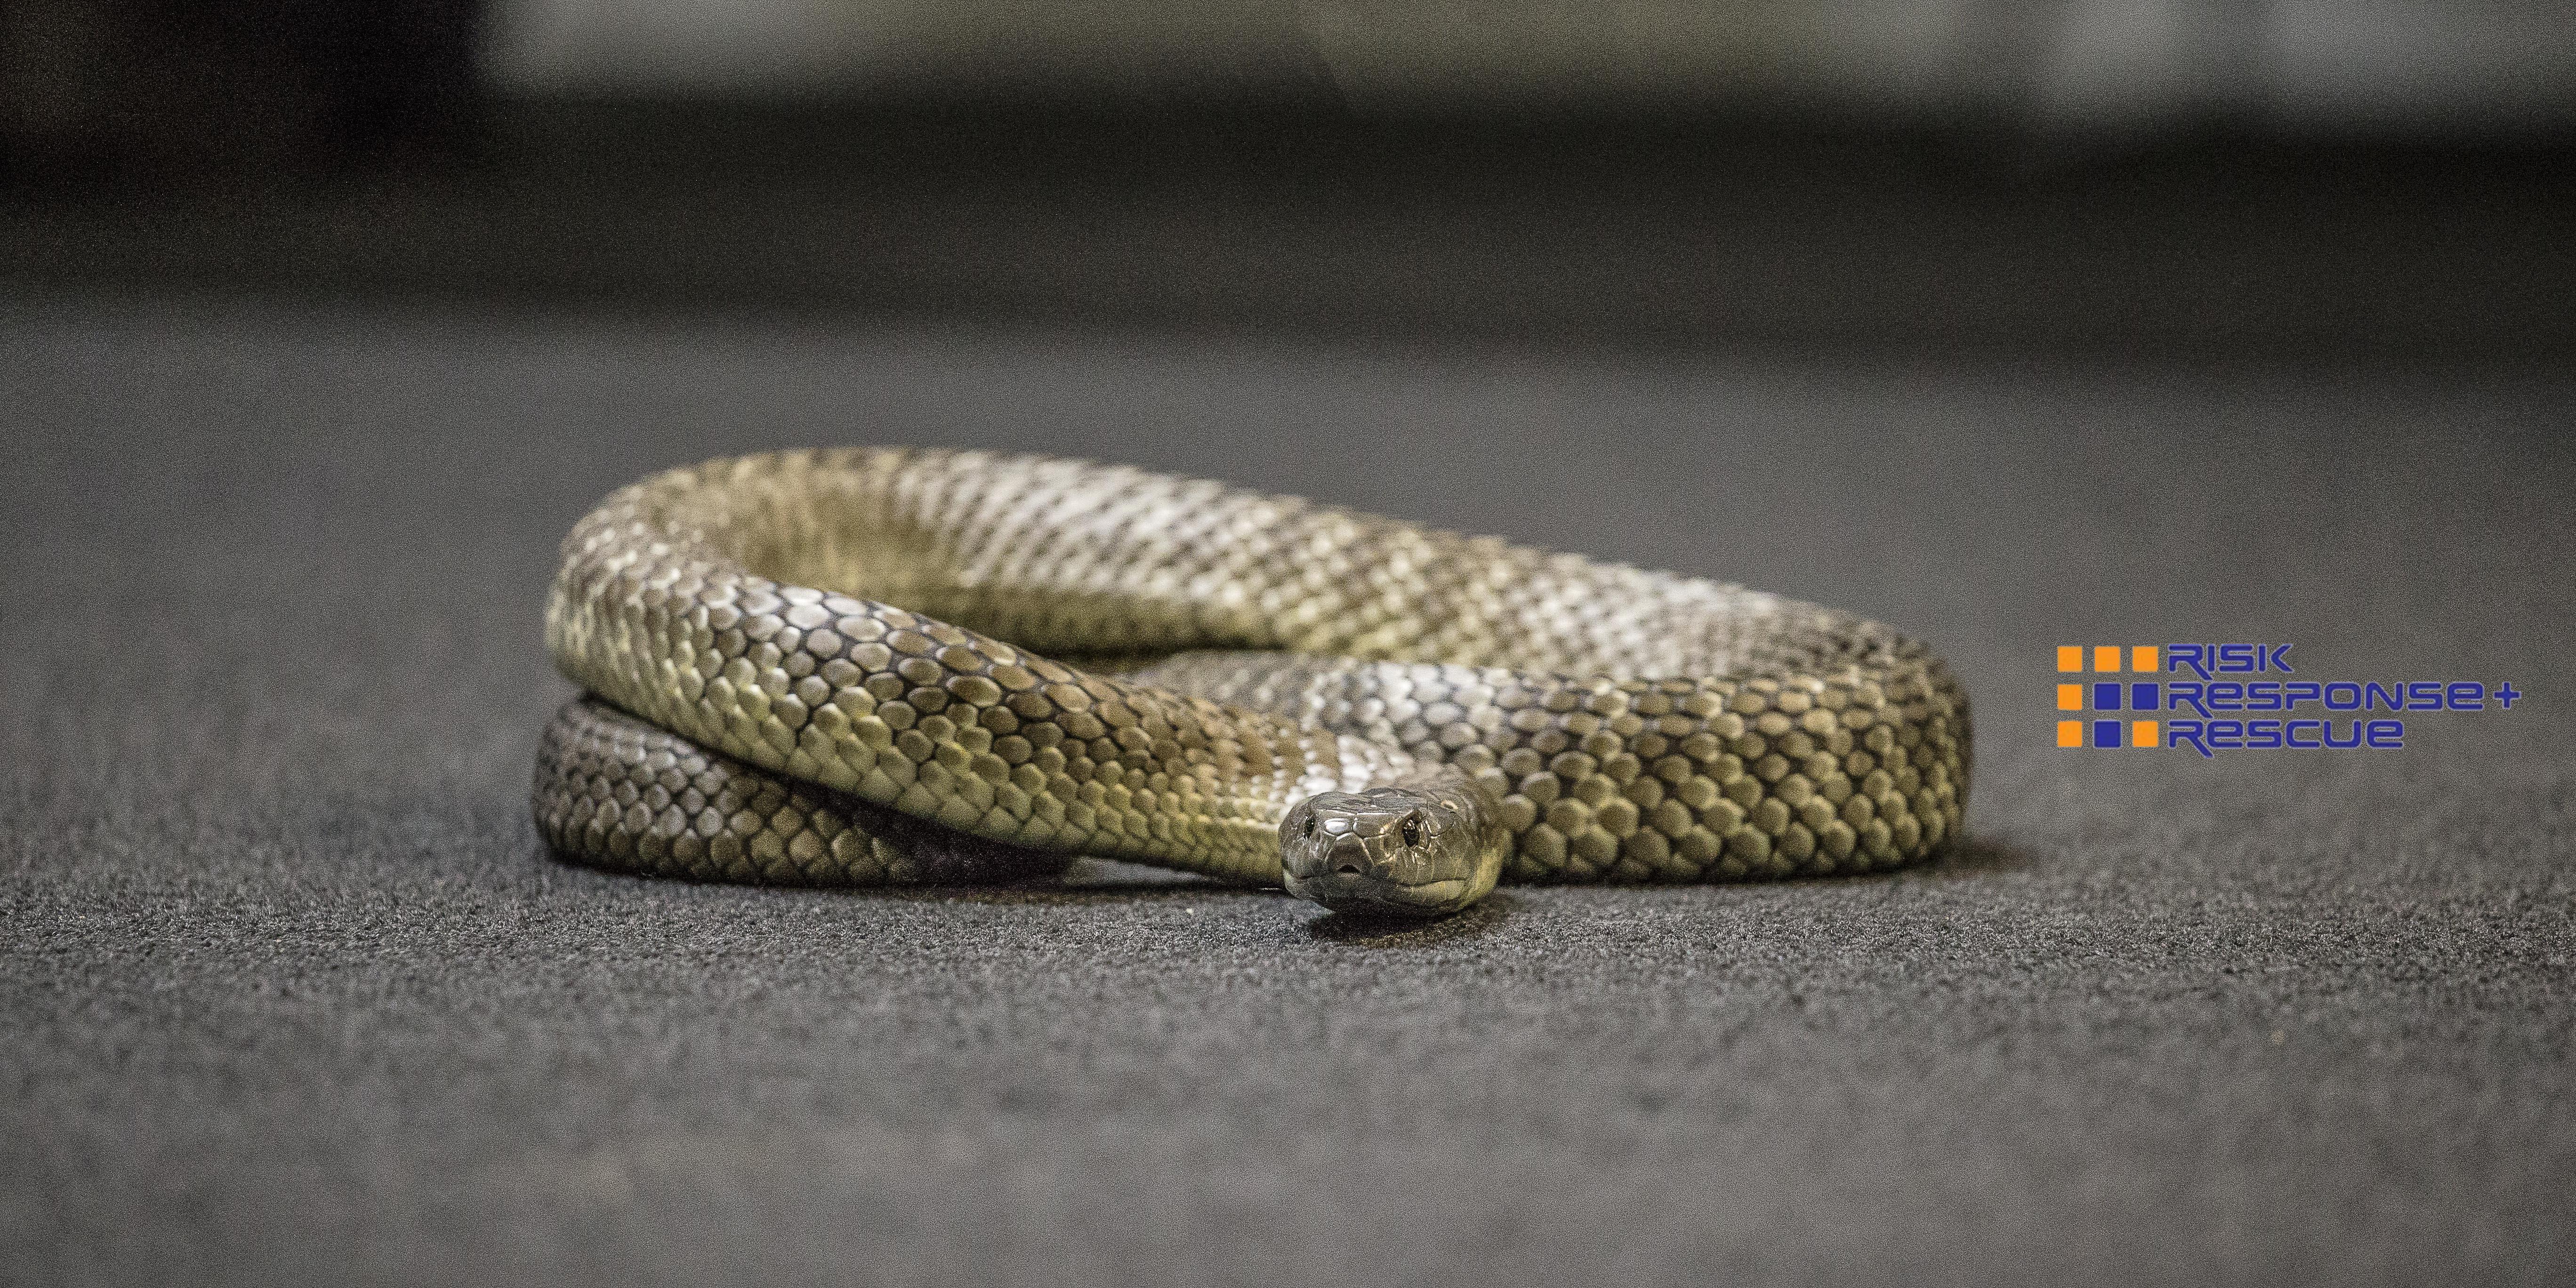 tiger snake floor rrr